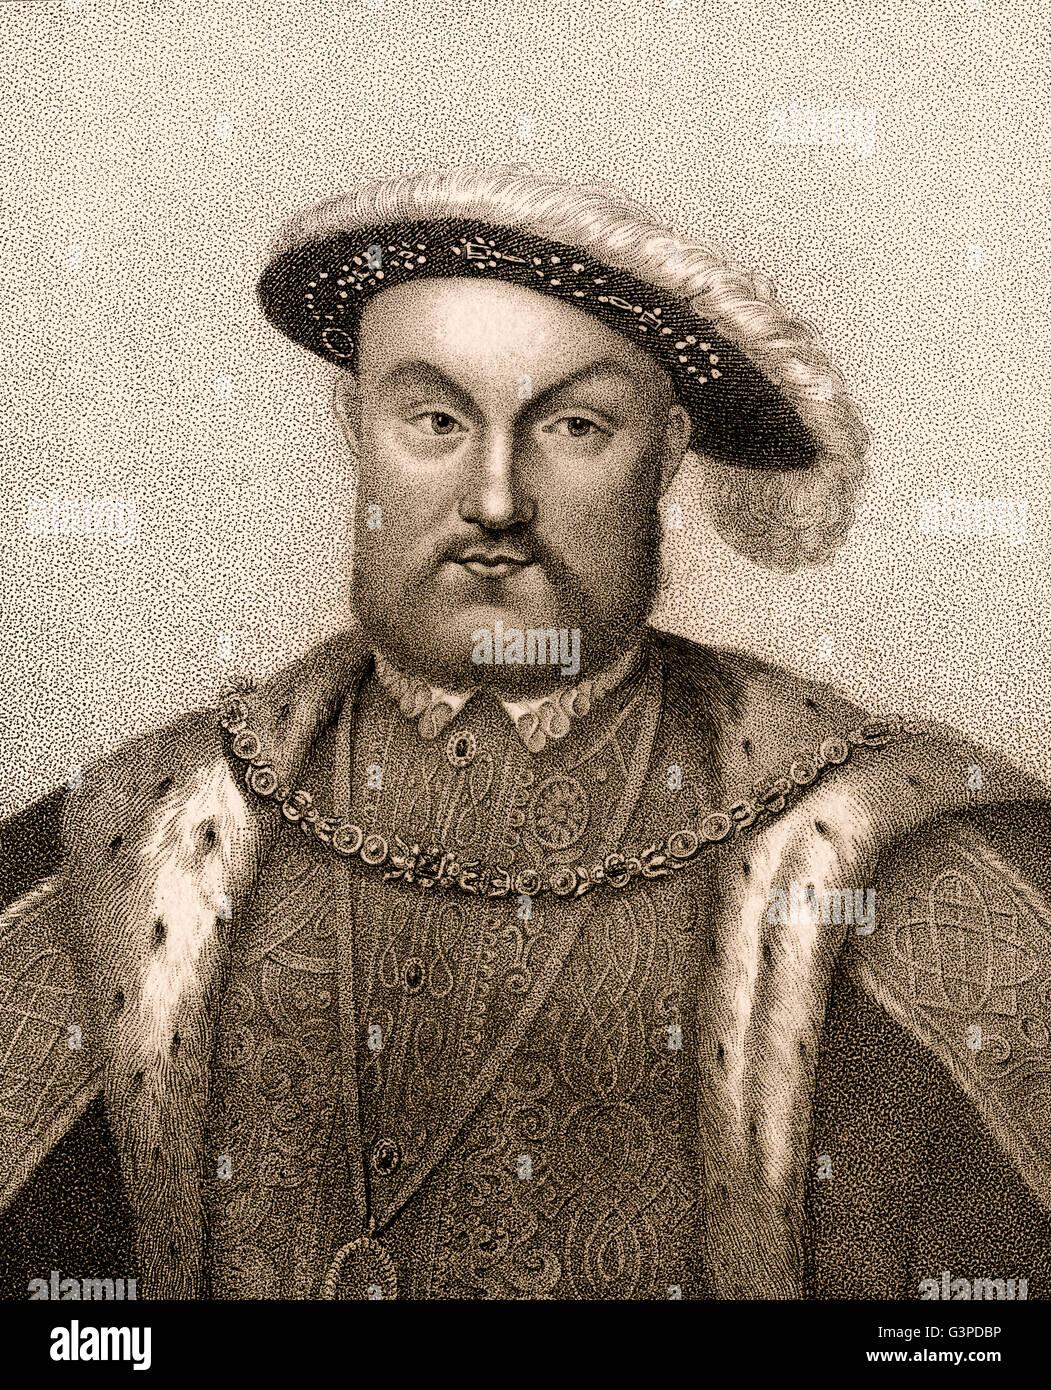 Henry VIII,  1491-1547, King of England - Stock Image